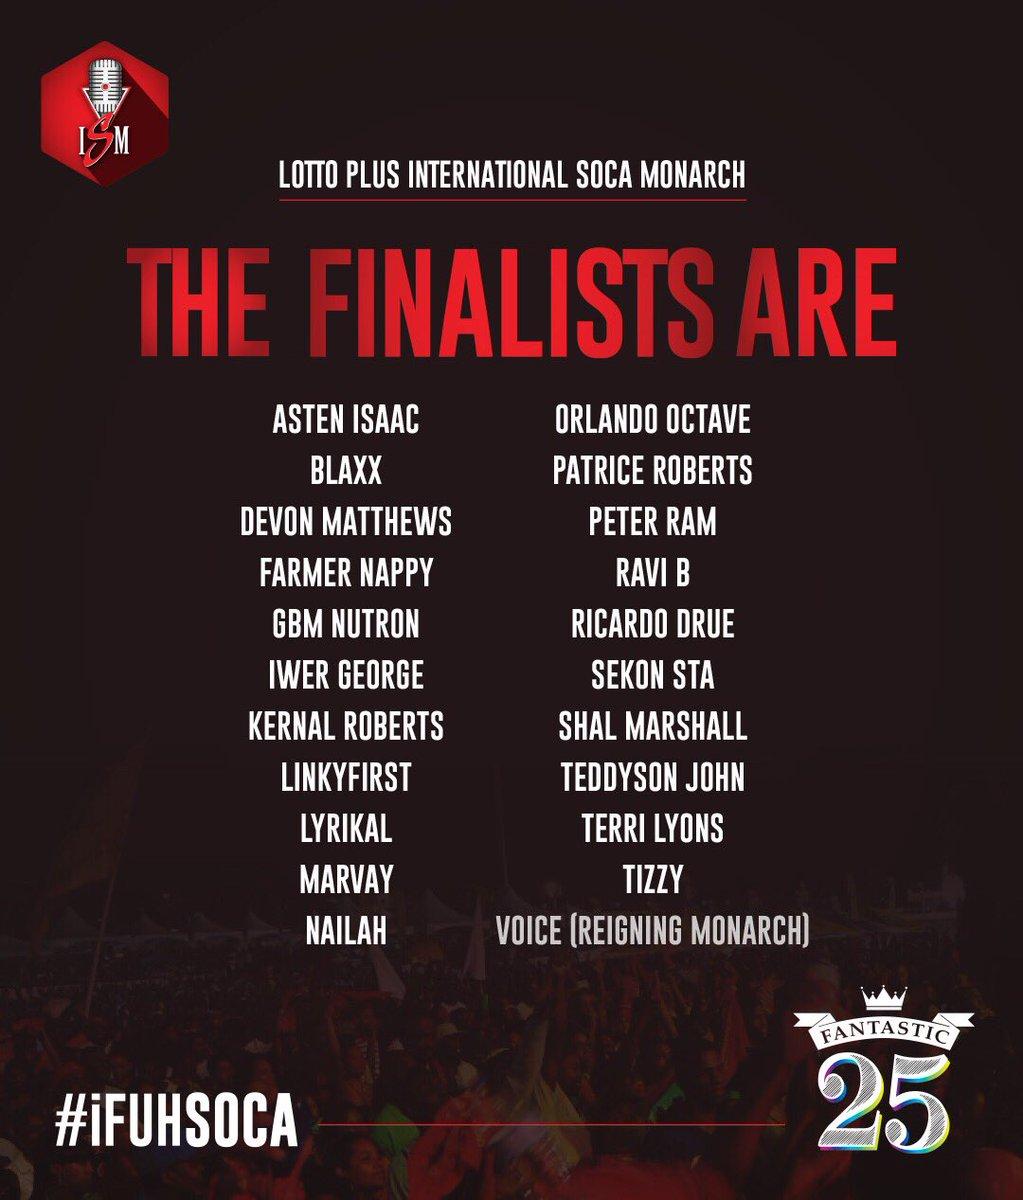 Your International Soca Monarch 2017 Finalists are.... https://t.co/2F0LEhjOEO